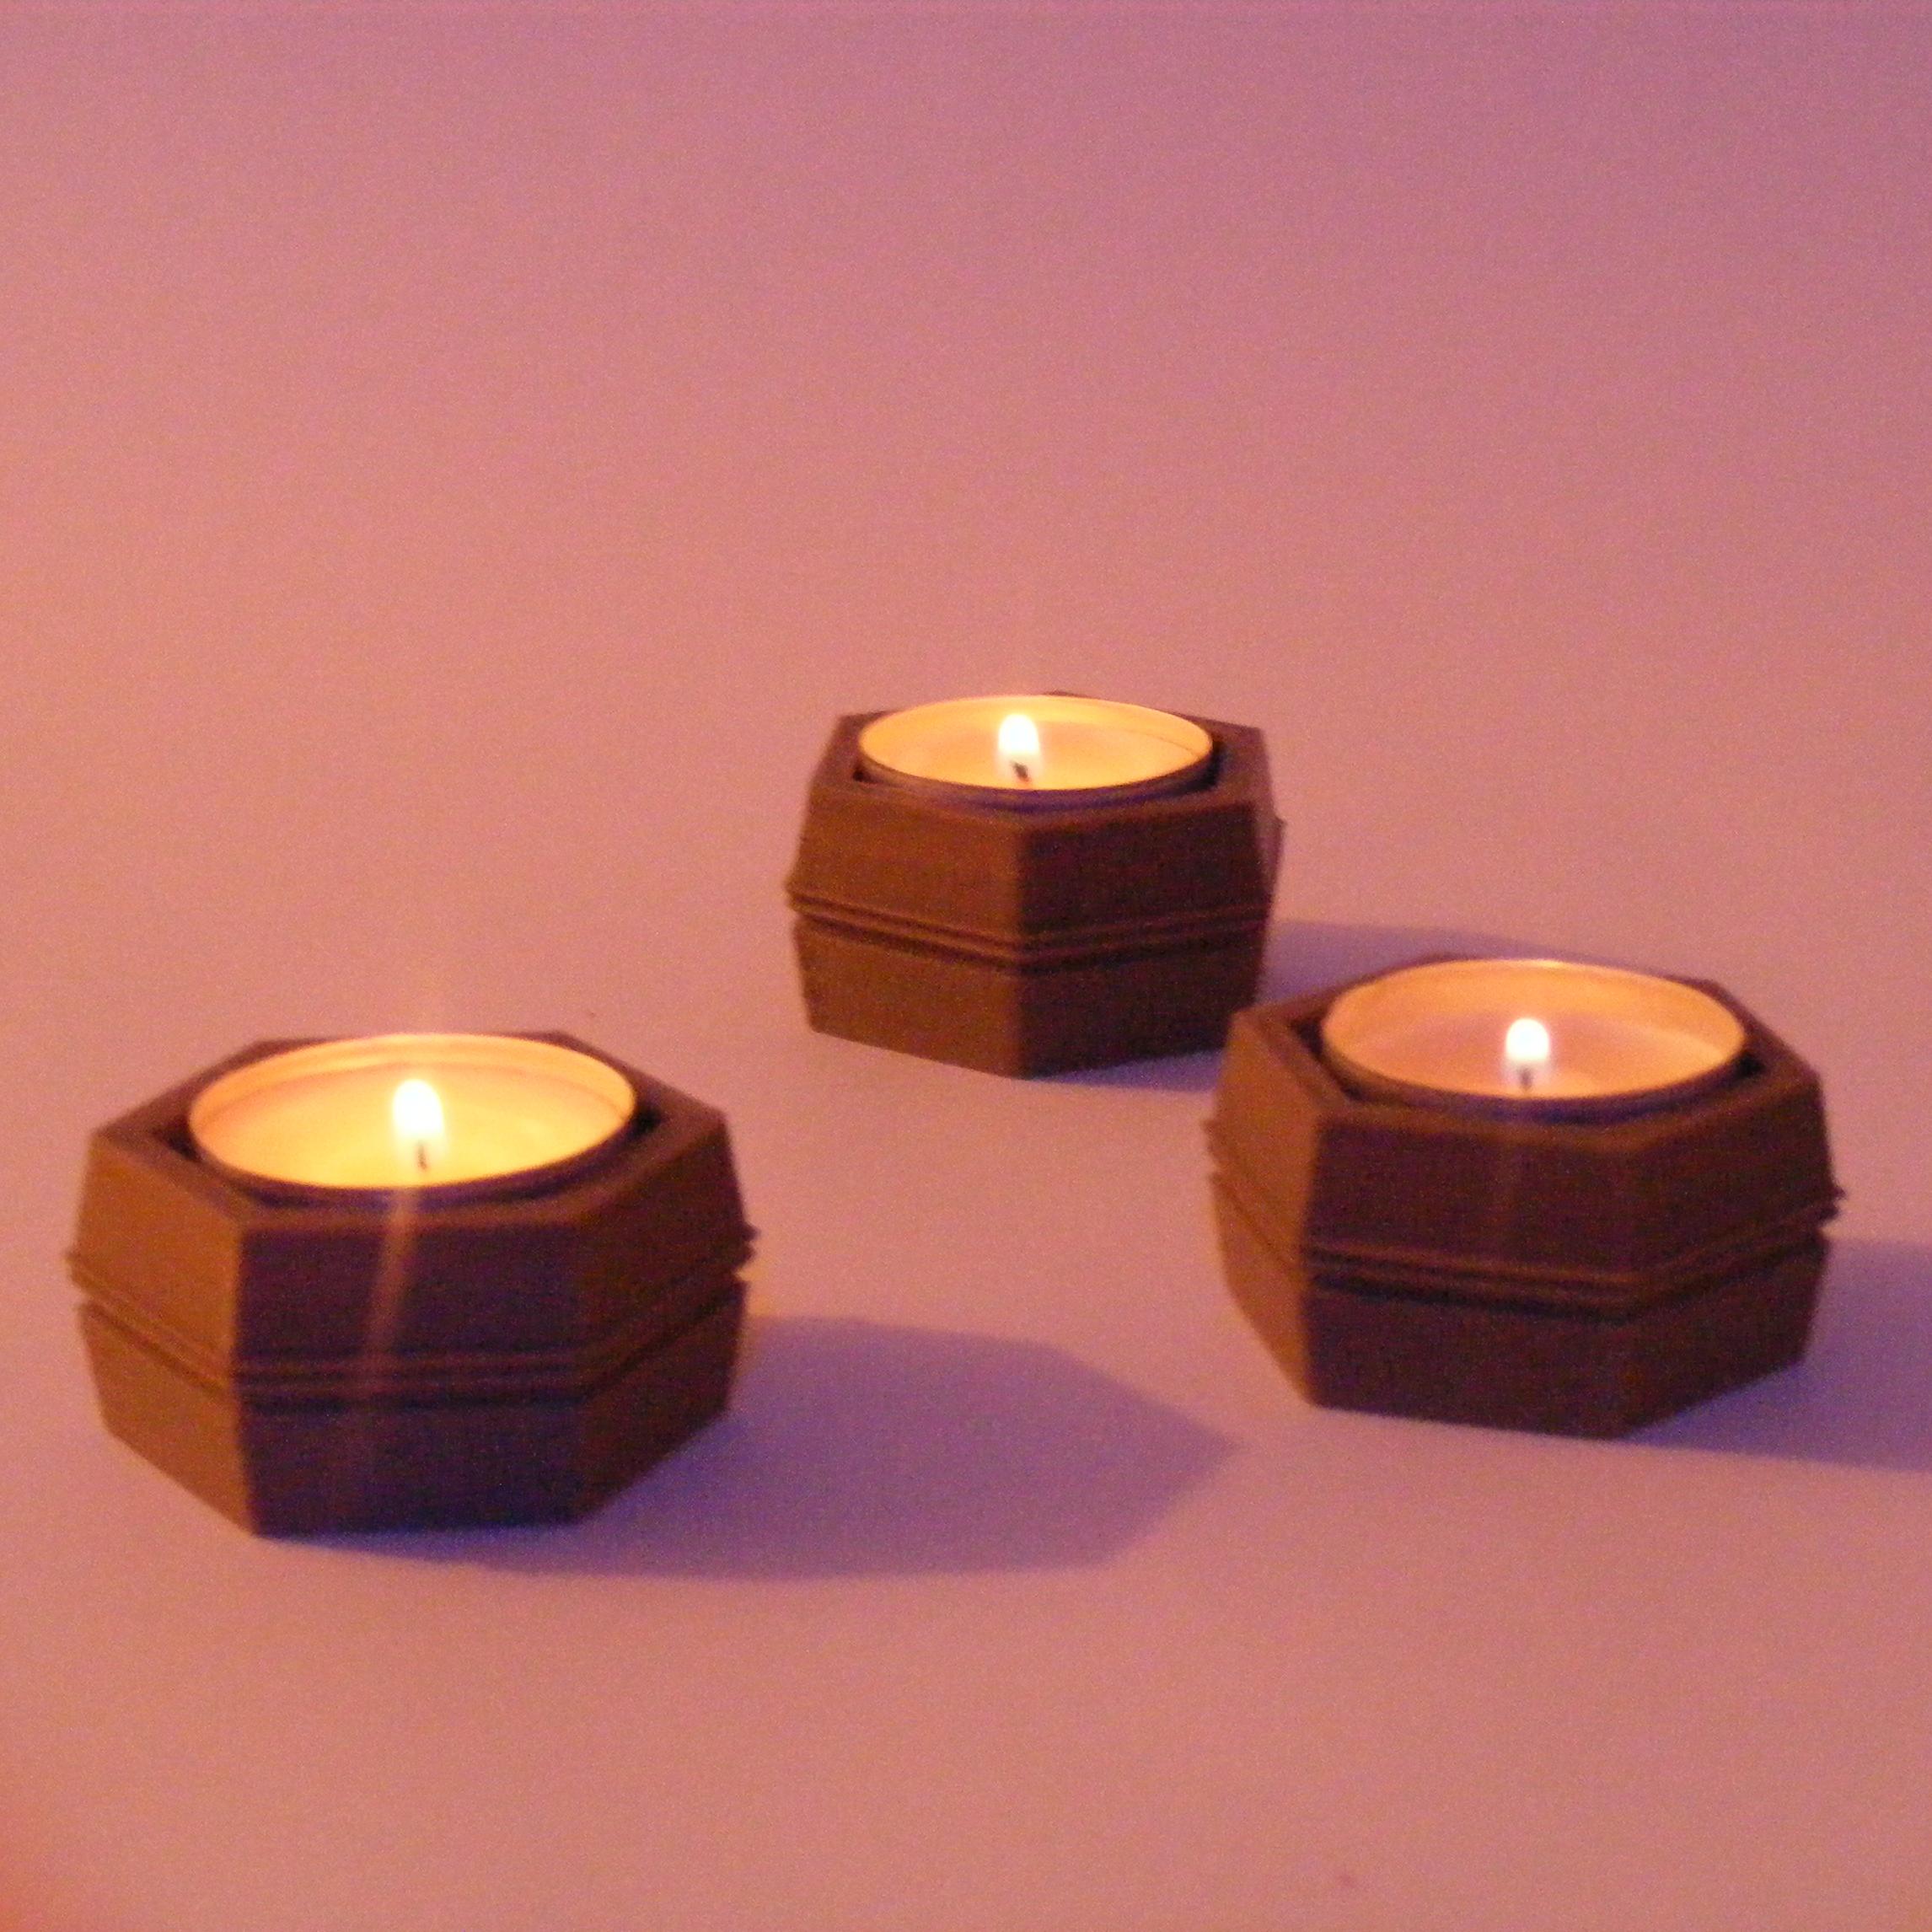 Hex Tea Light Holders  modern 3d printed hexagon candle